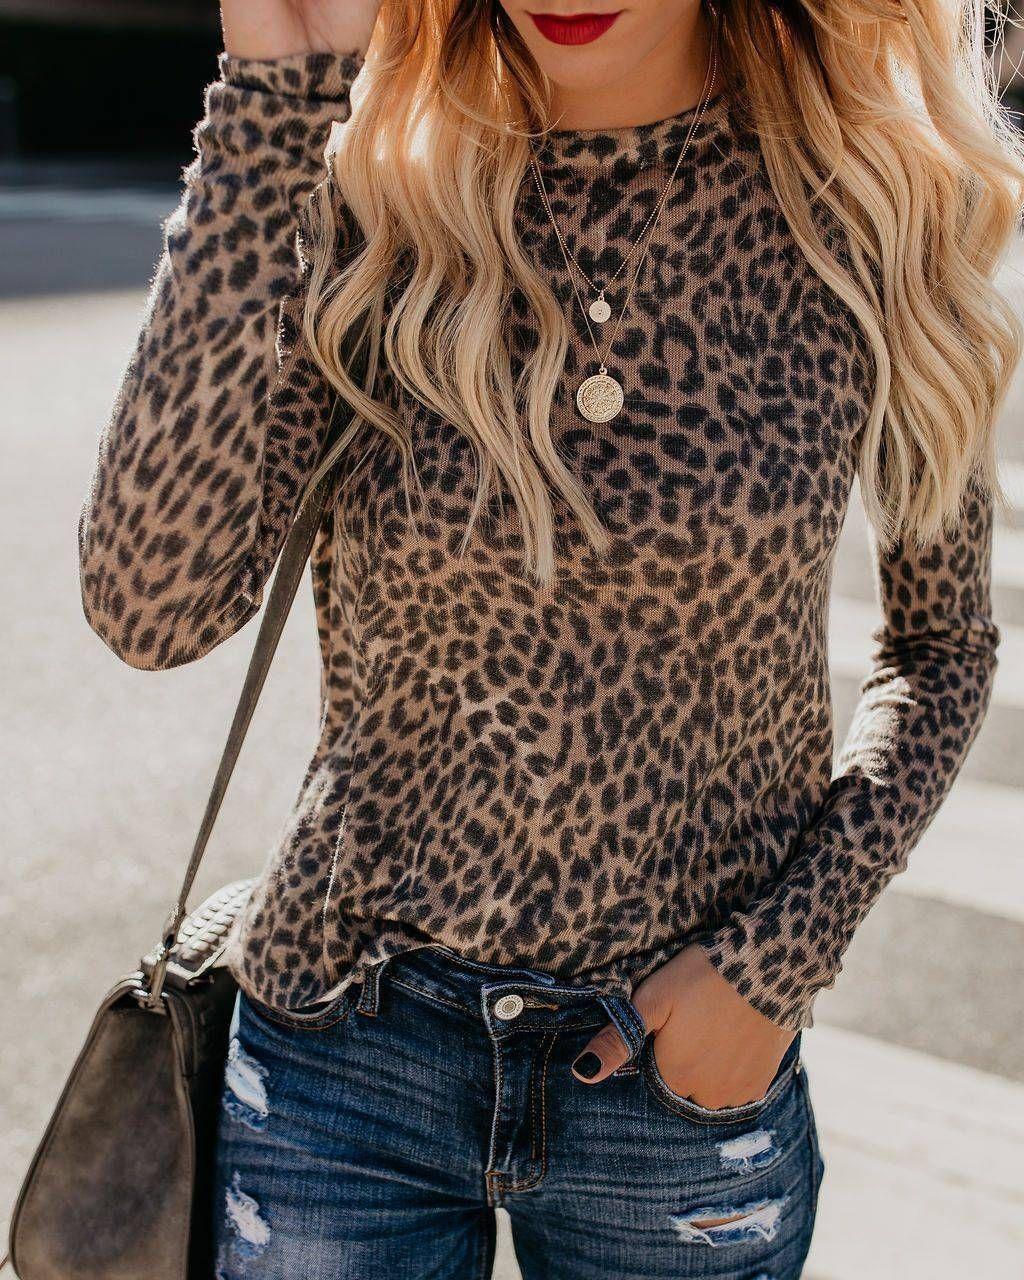 6e12693eab22 Fashion Women Ladies Leopard Print Crew Neck Loose Casual T-Shirt Blouse  Tops US